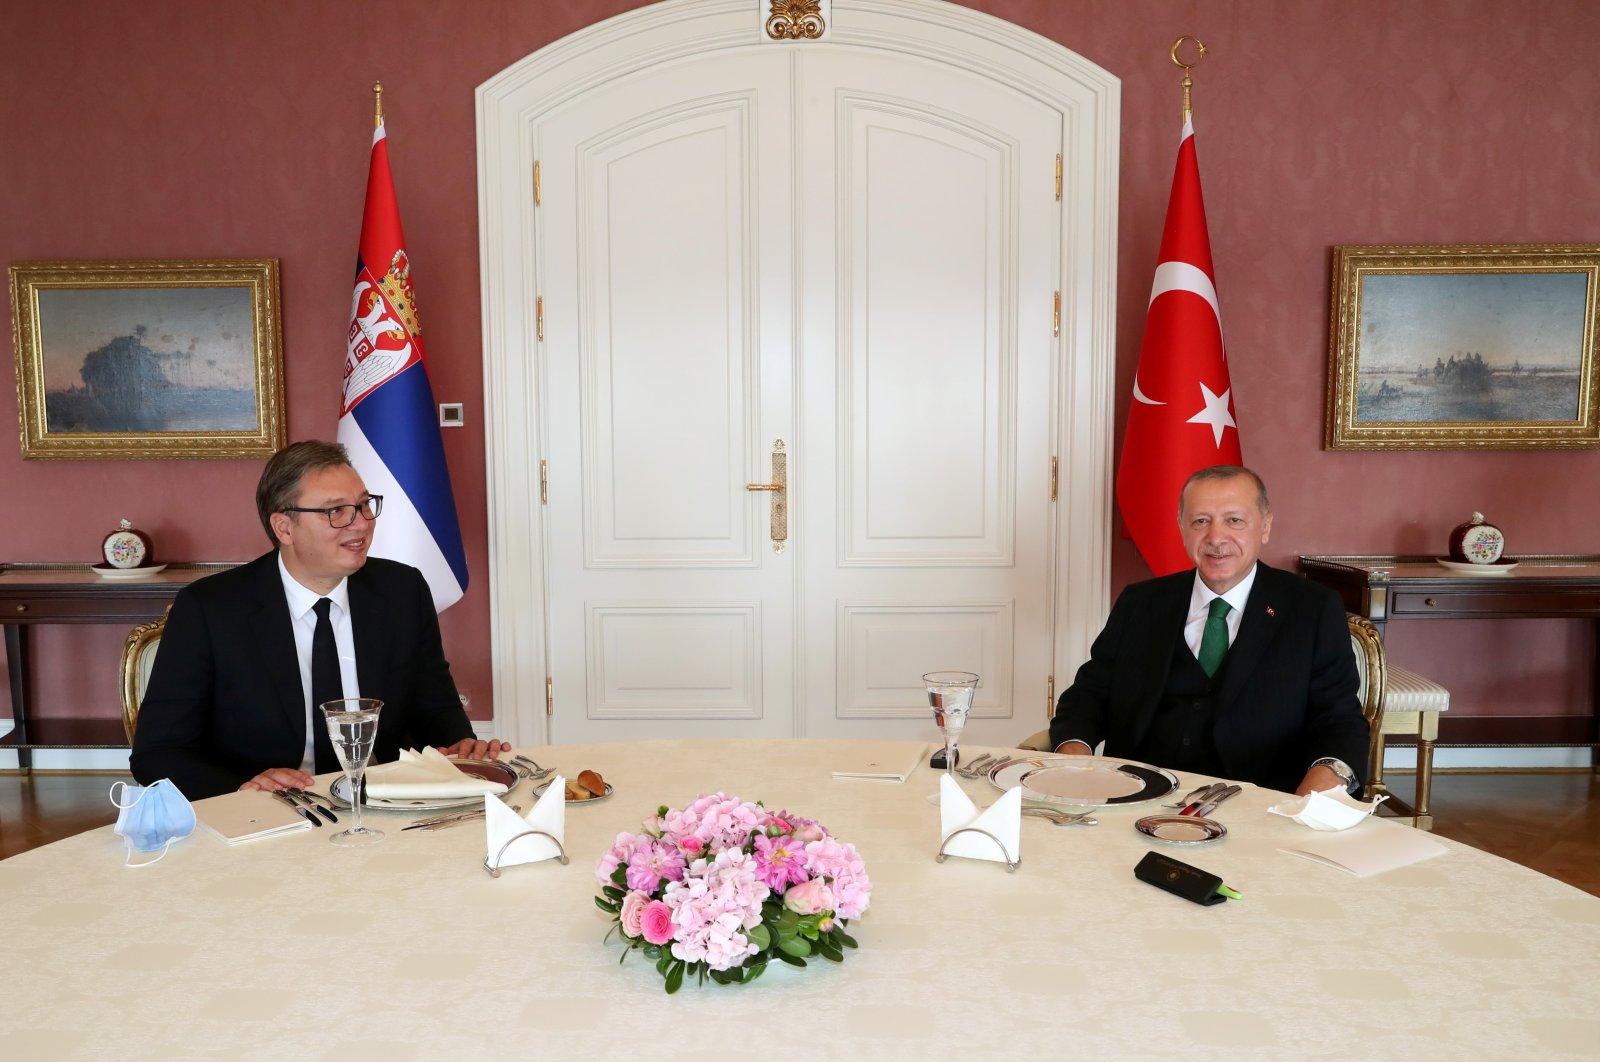 President Tayyip Erdoğan meets with his Serbian counterpart Aleksandar Vucic in Istanbul, Turkey, Sept. 25, 2020. (Reuters Photo)